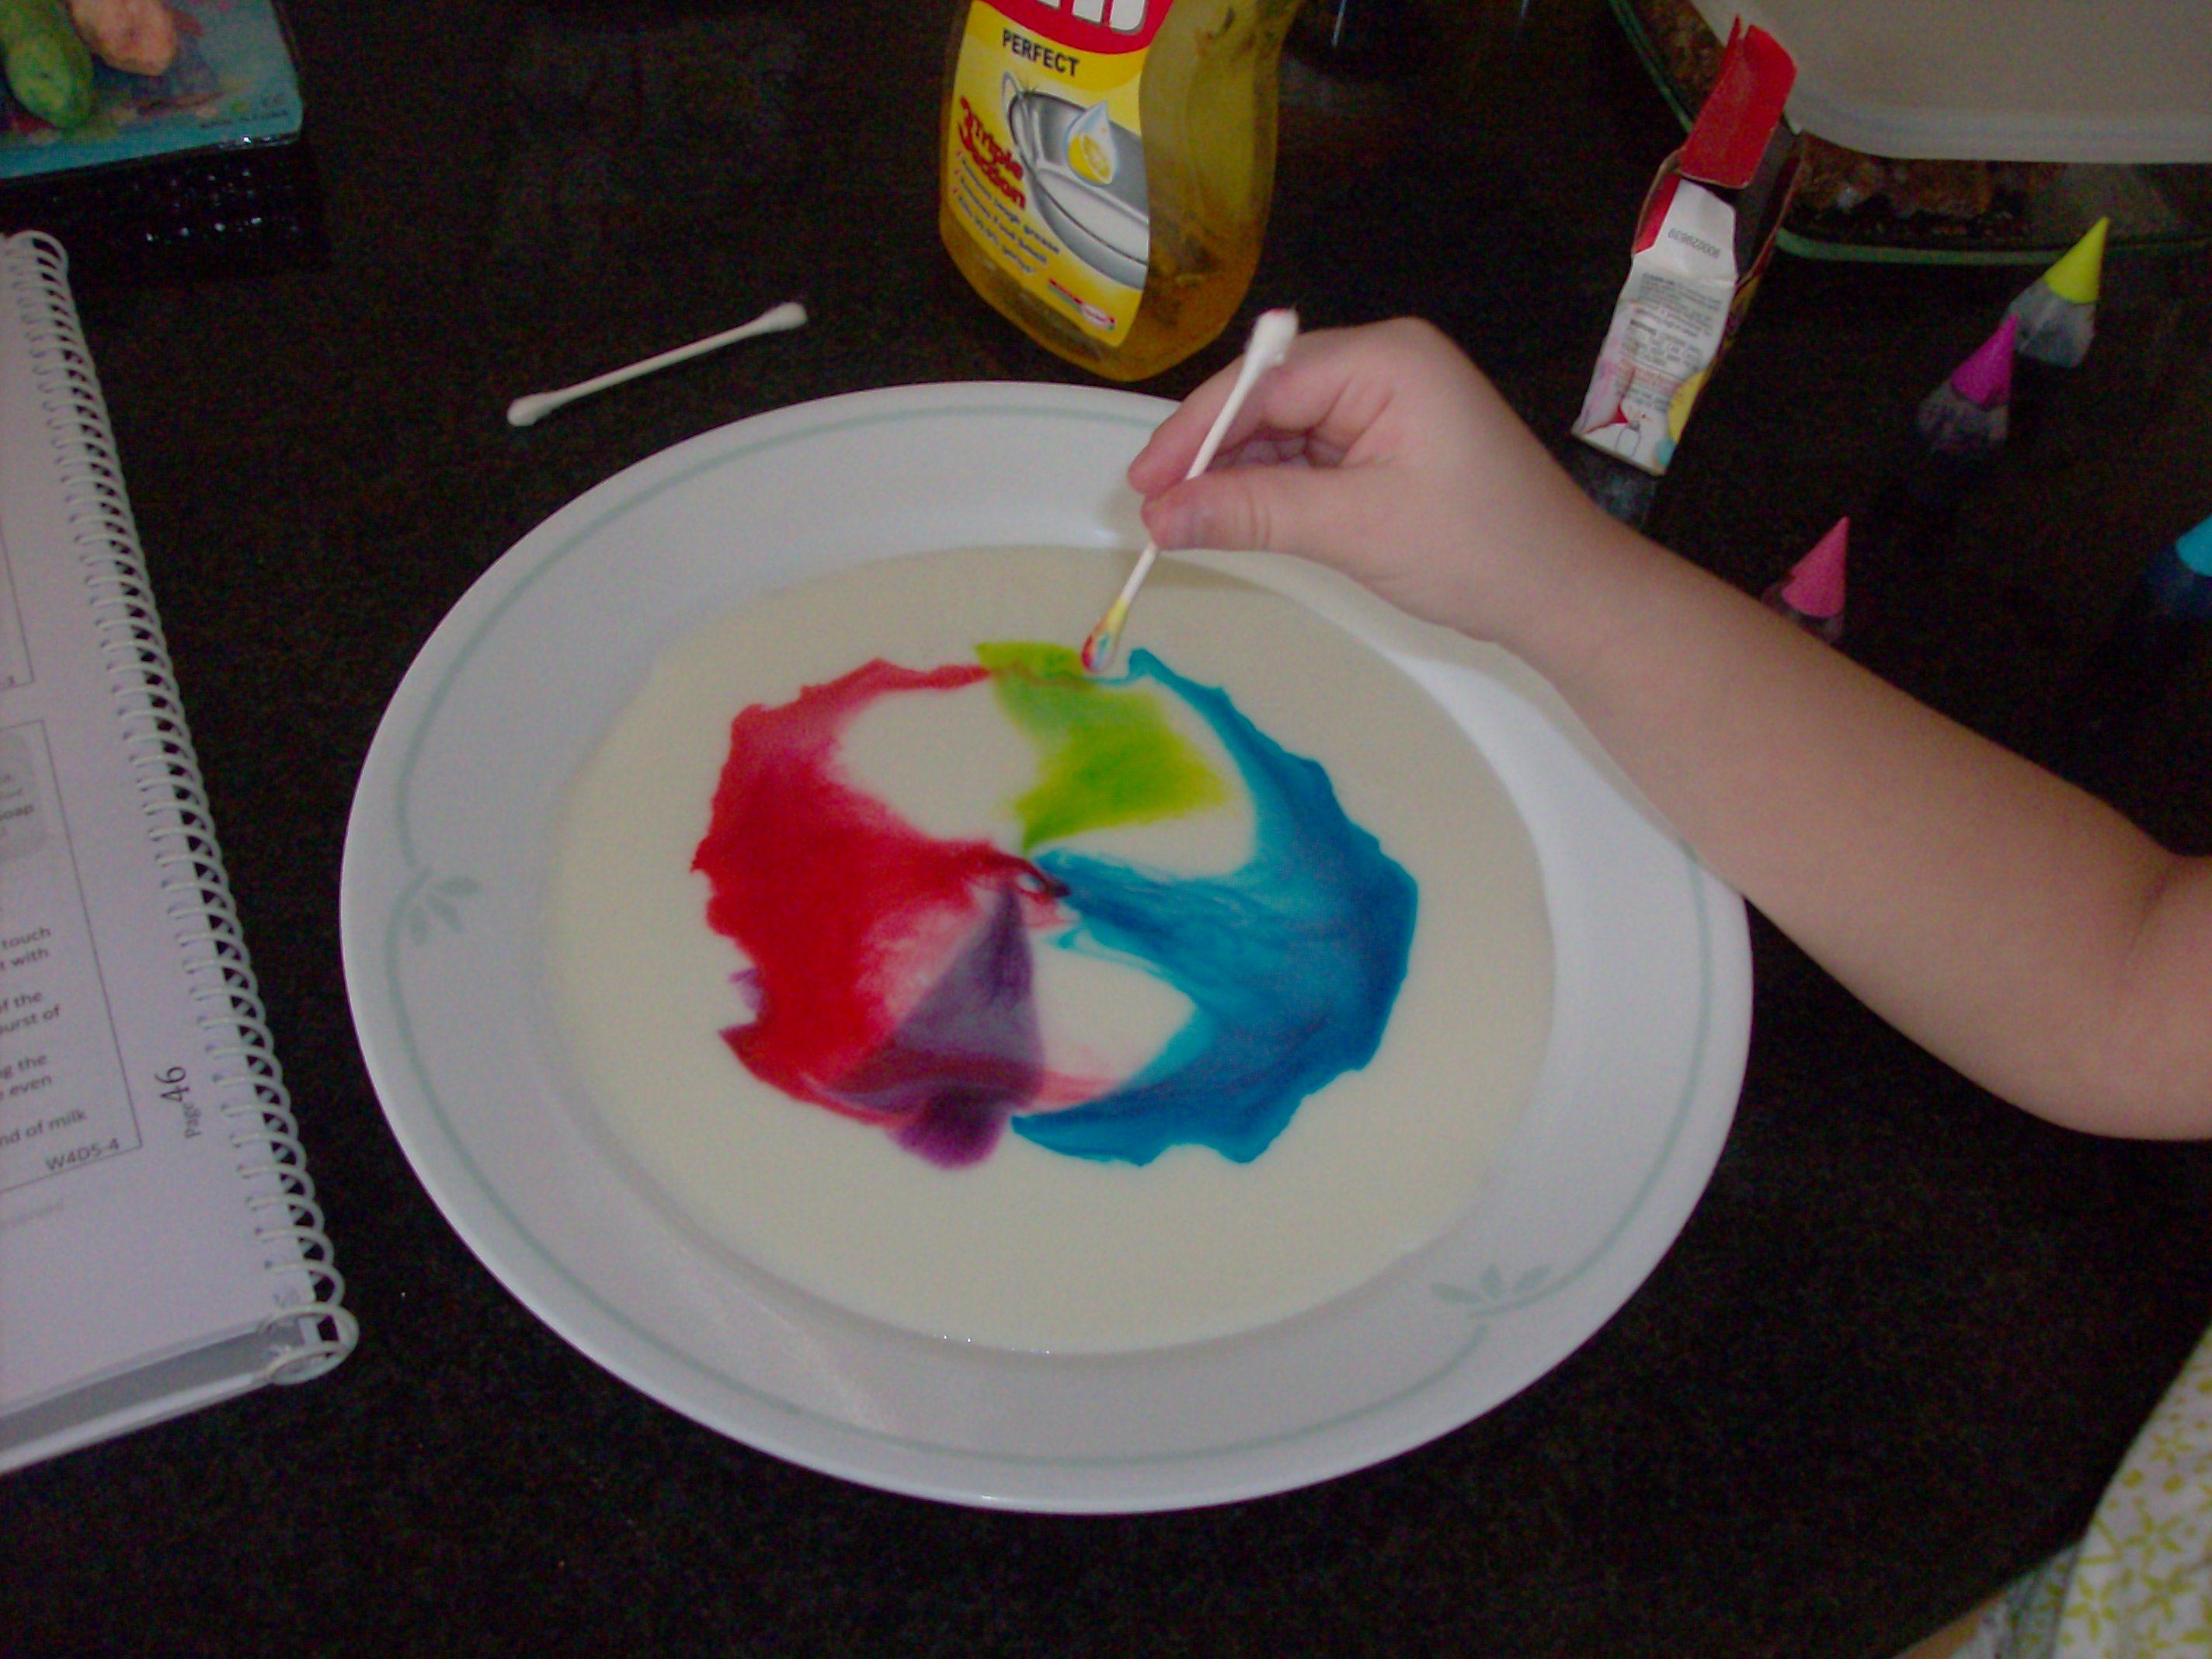 Fun for Kids: Magic Milk Fireworks Kitchen Experiment | Mommysavers